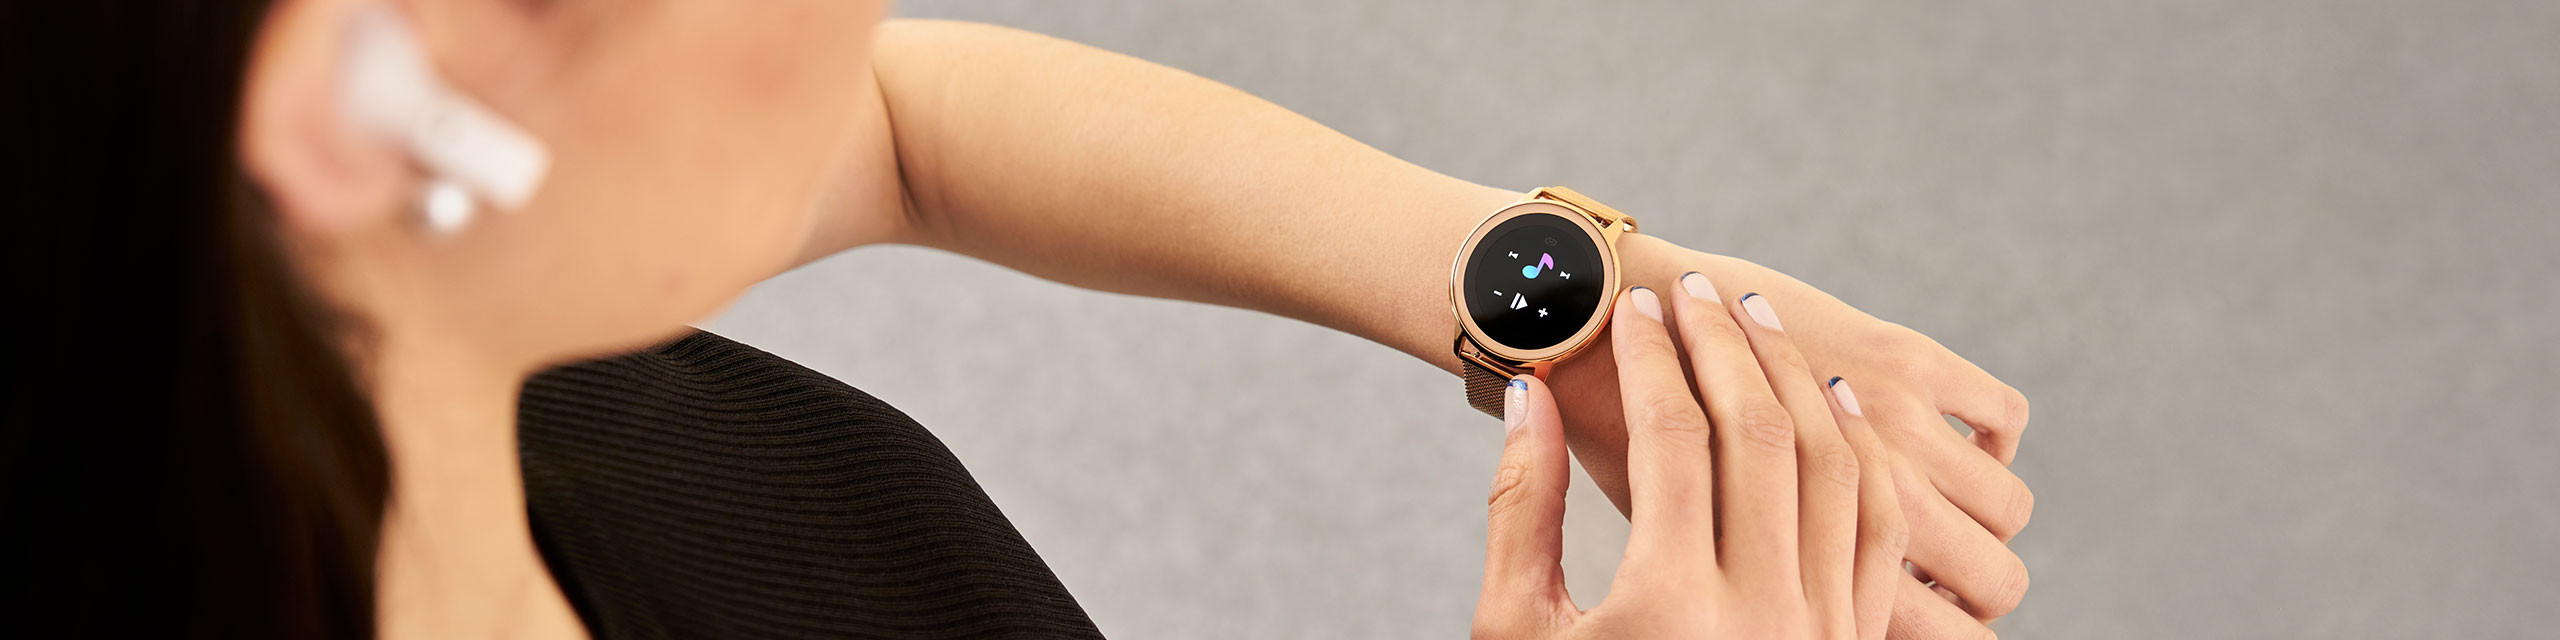 Relojes inteligentes ▷ Smartwatches ⌚- Radiant España